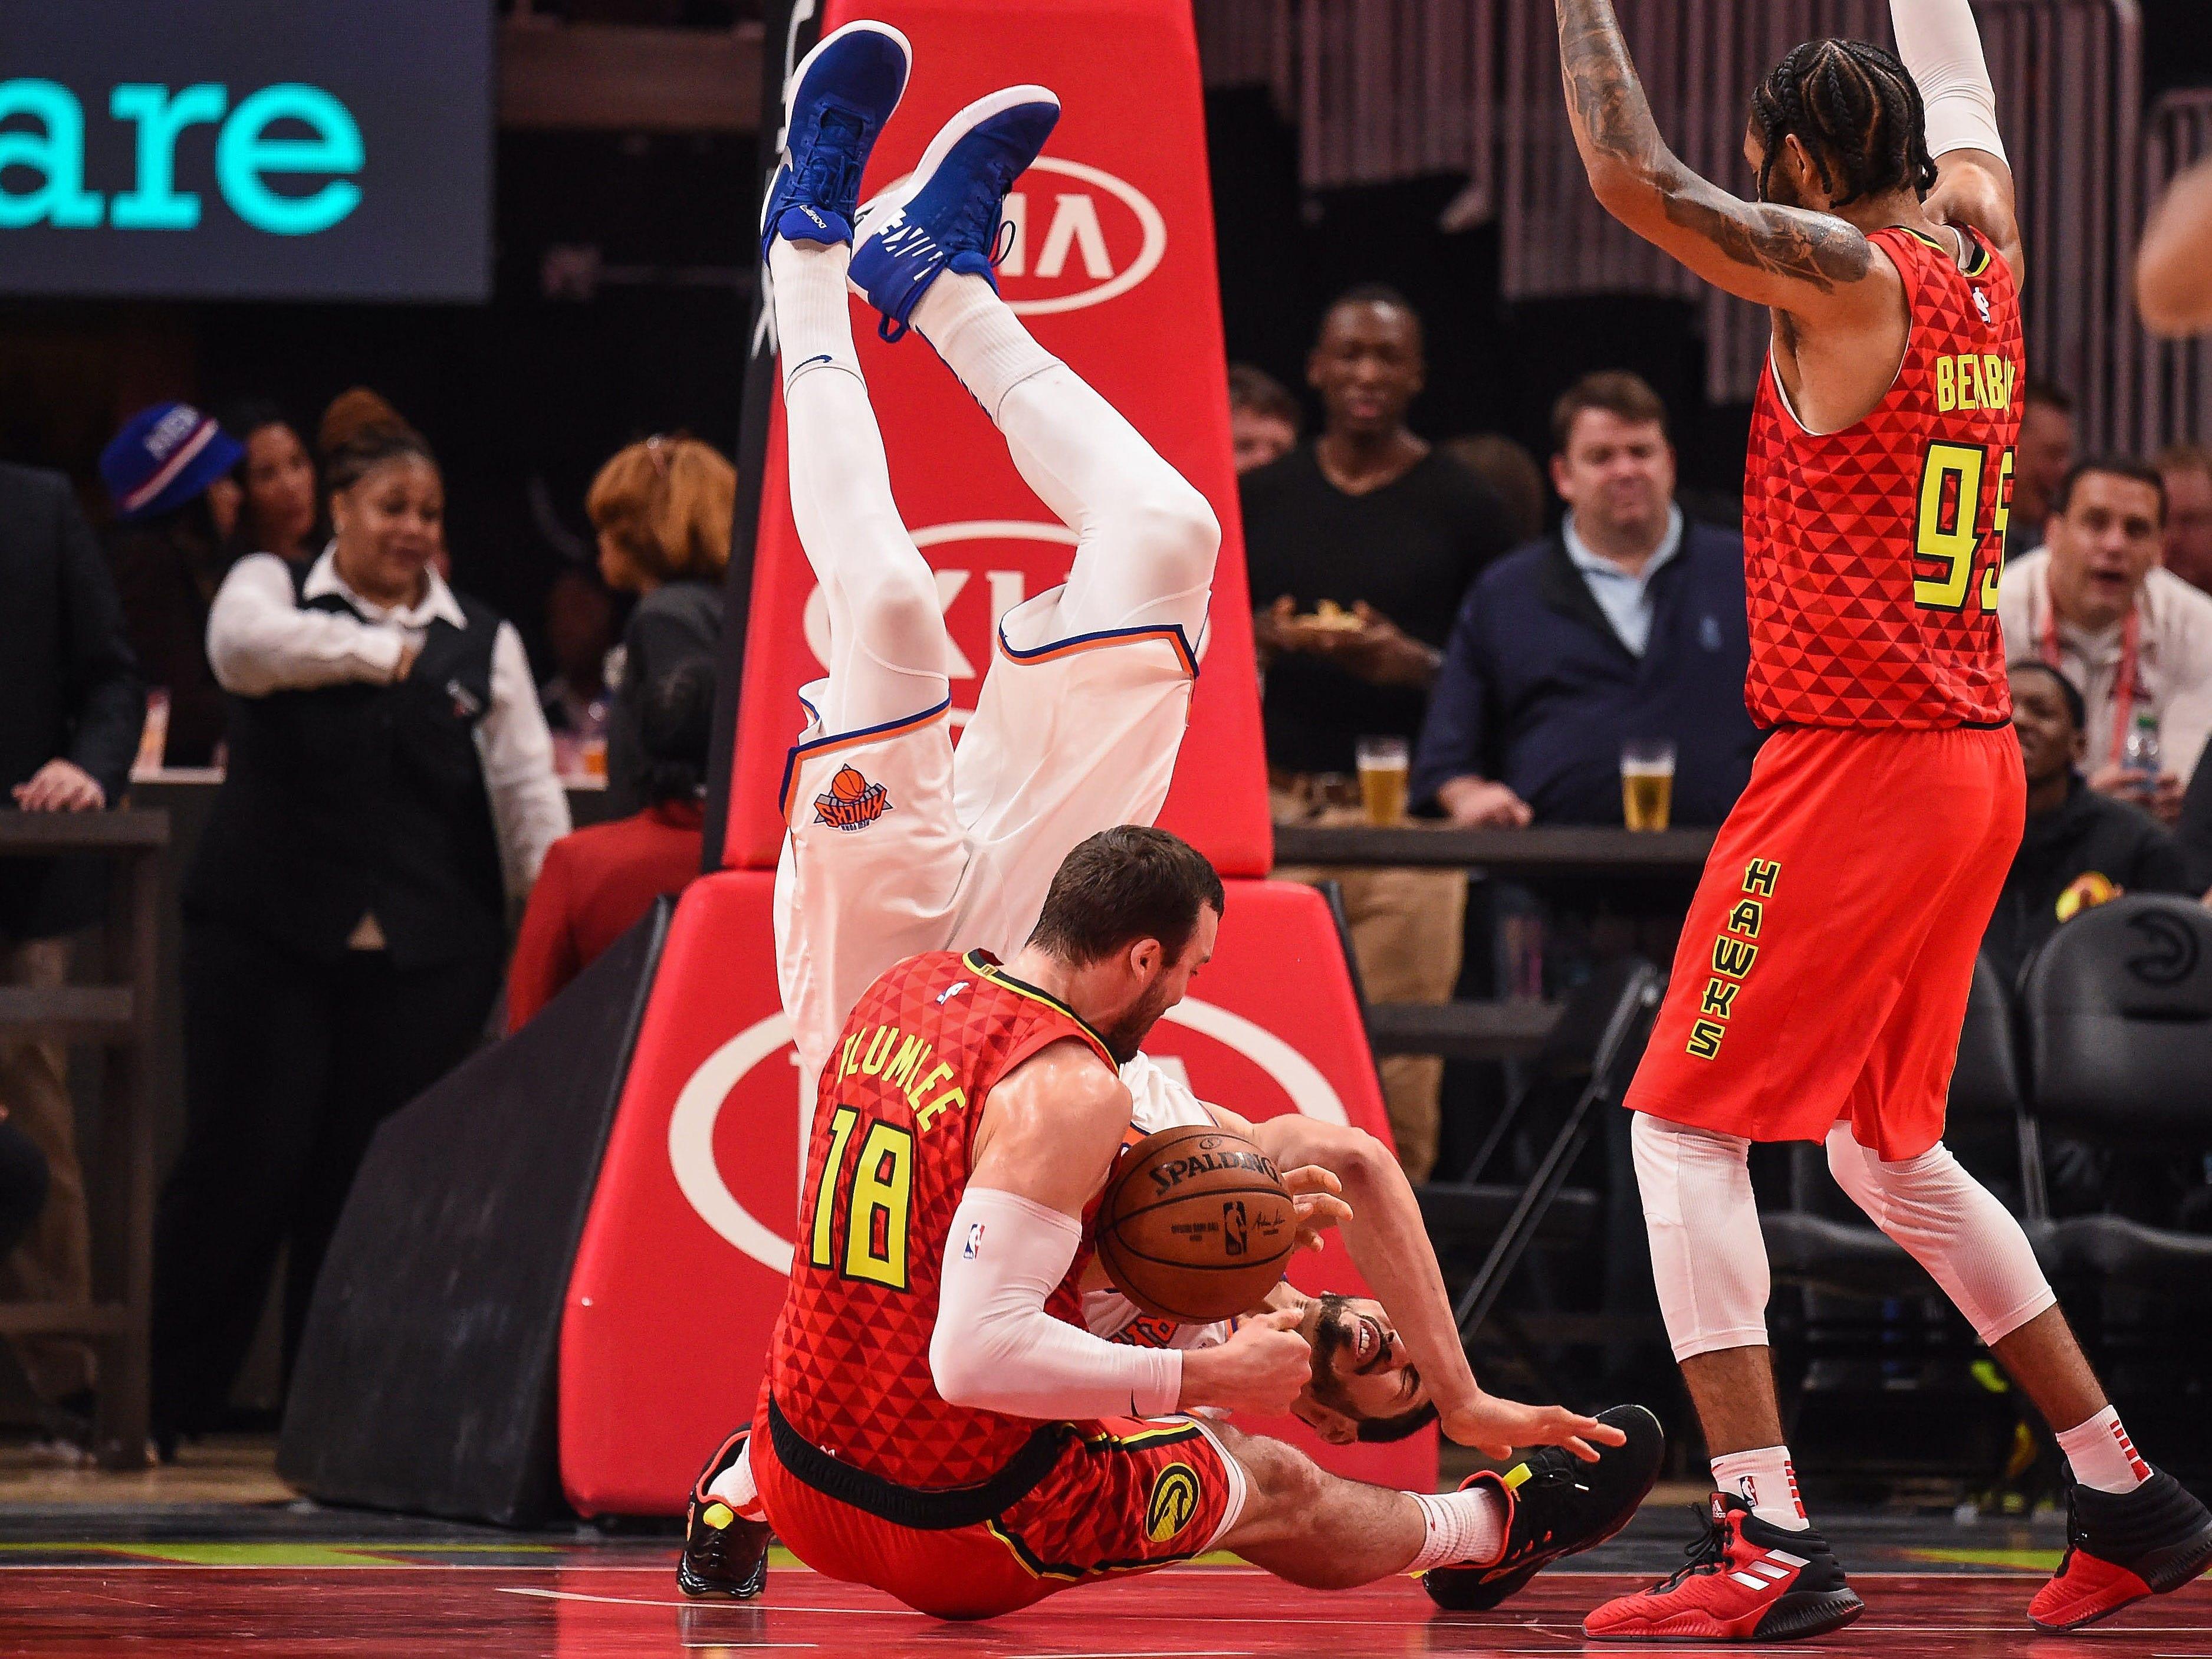 Nov. 7: Knicks center Enes Kanter (00) flips over Hawks center Miles Plumlee (18) during a second-half scramble for the ball in Atlanta.